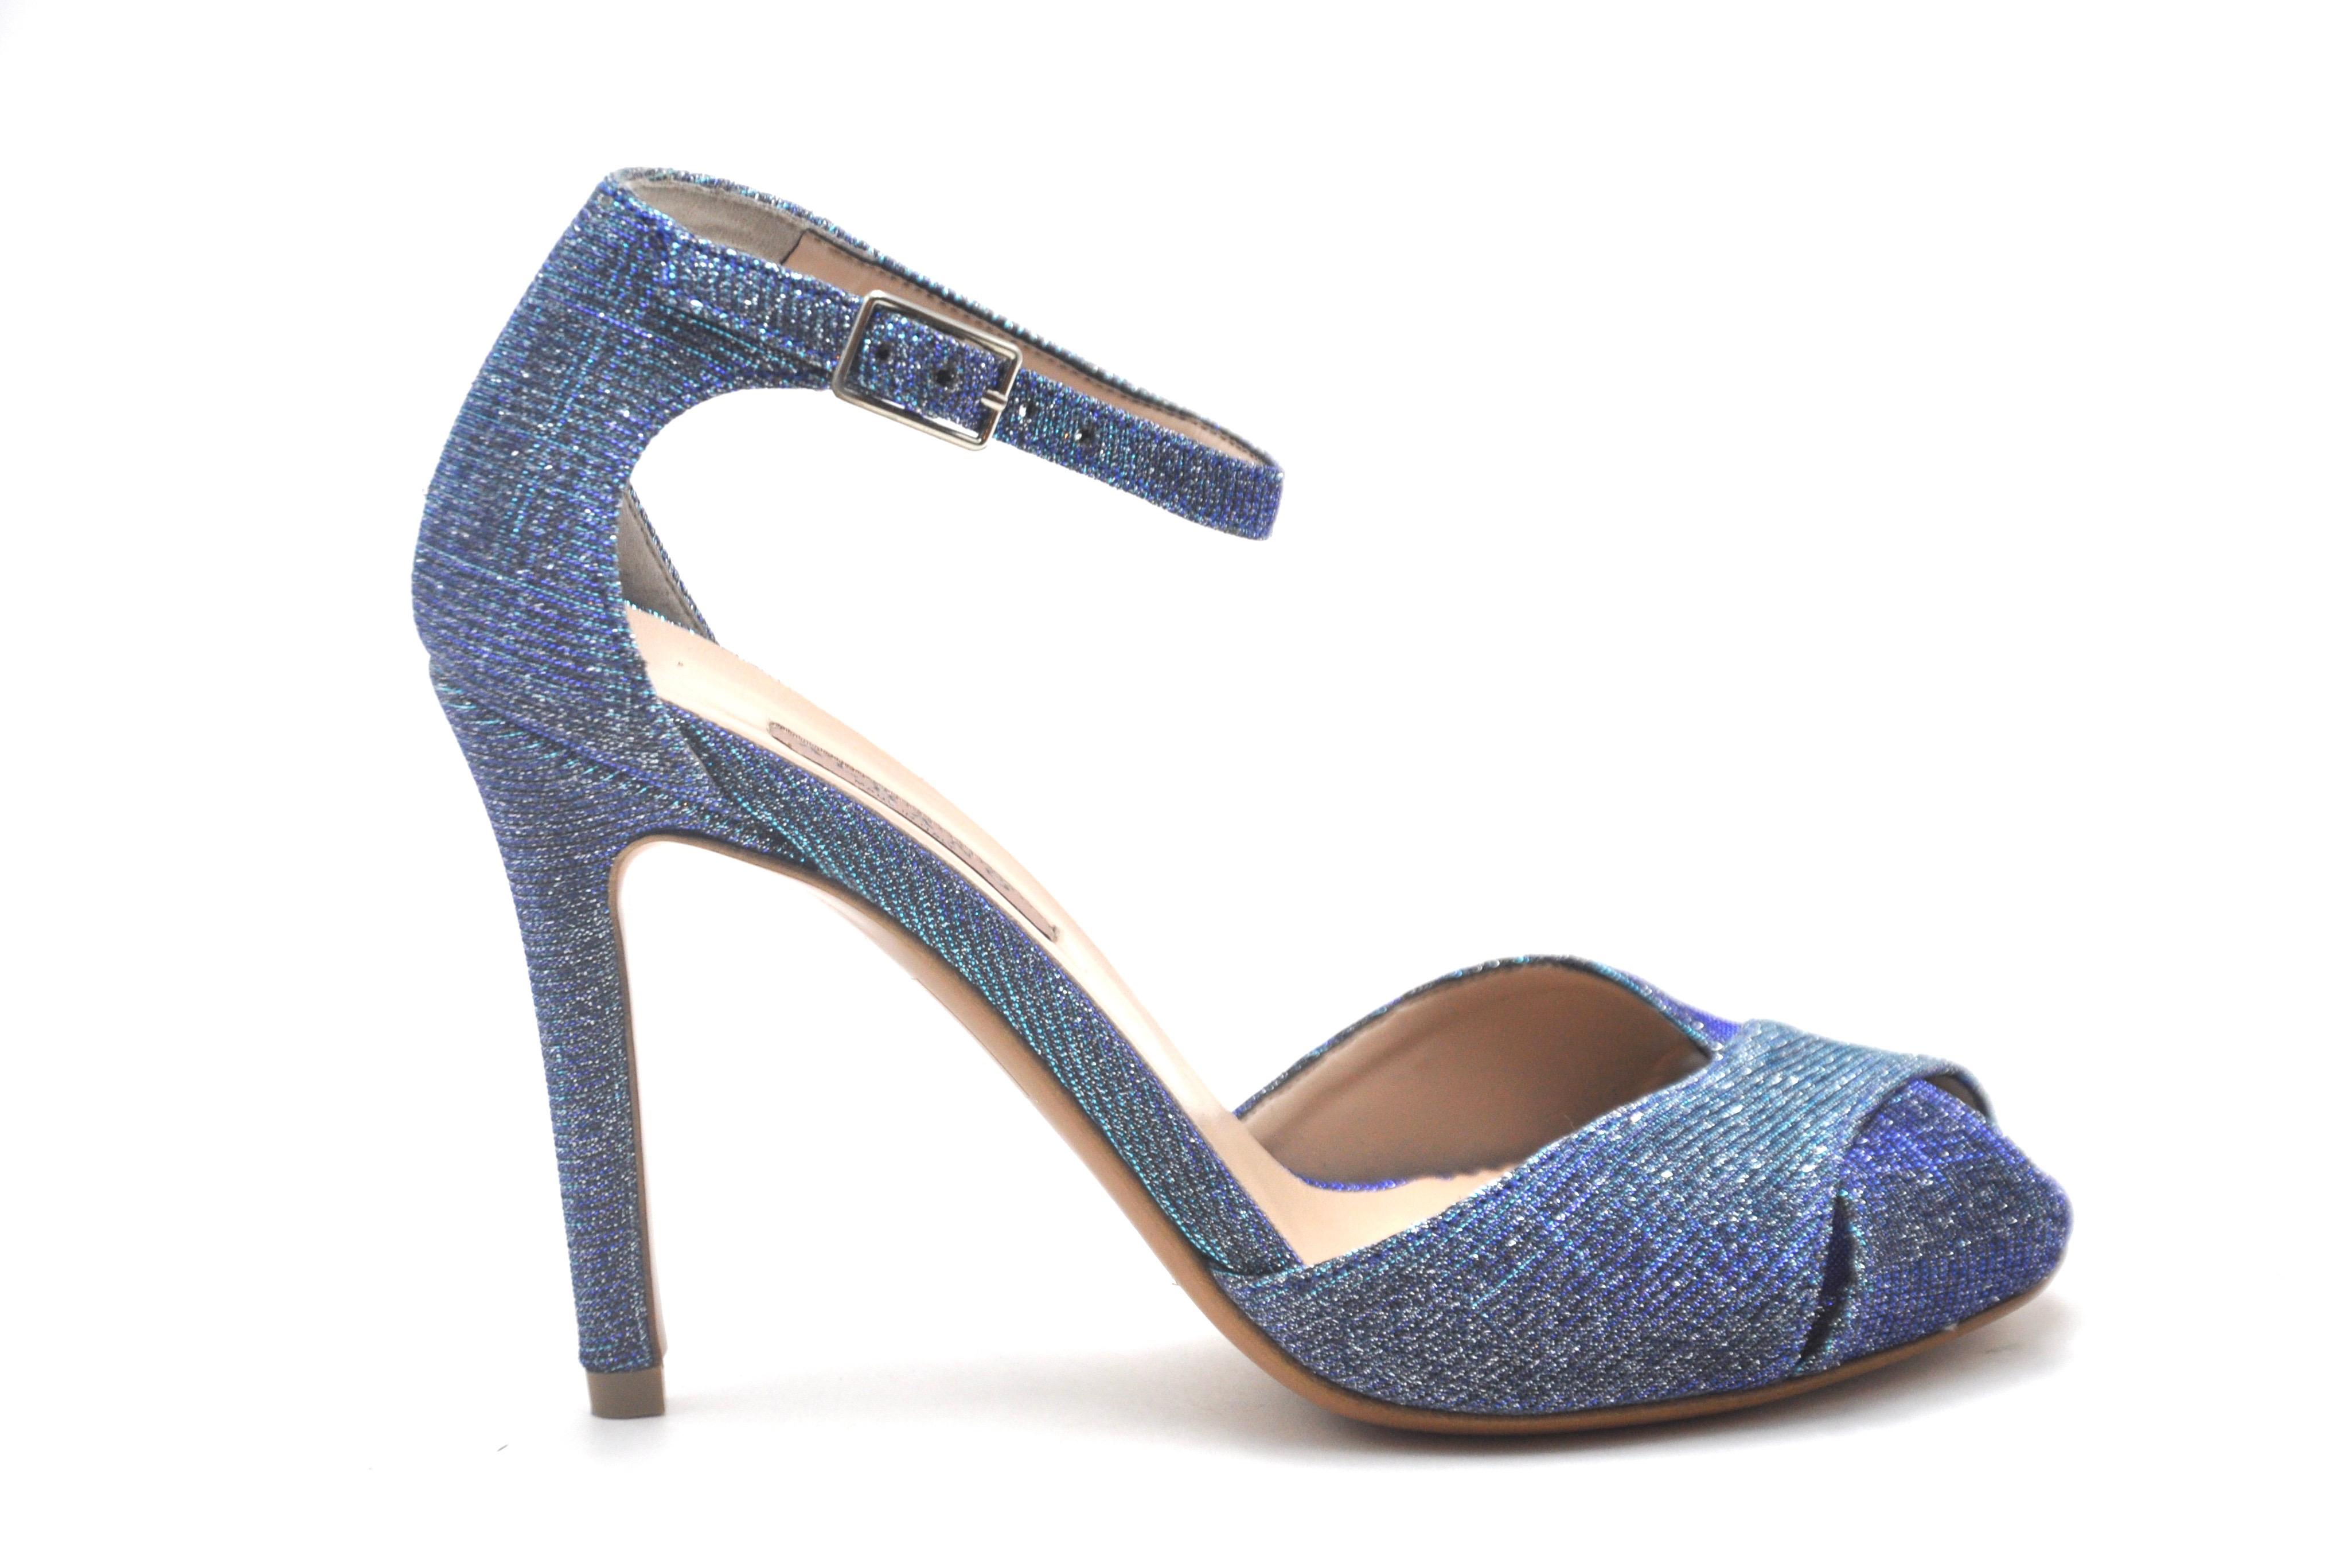 Sandali glitter blu ALBANO | Sandali | 4048NIGHTBLU